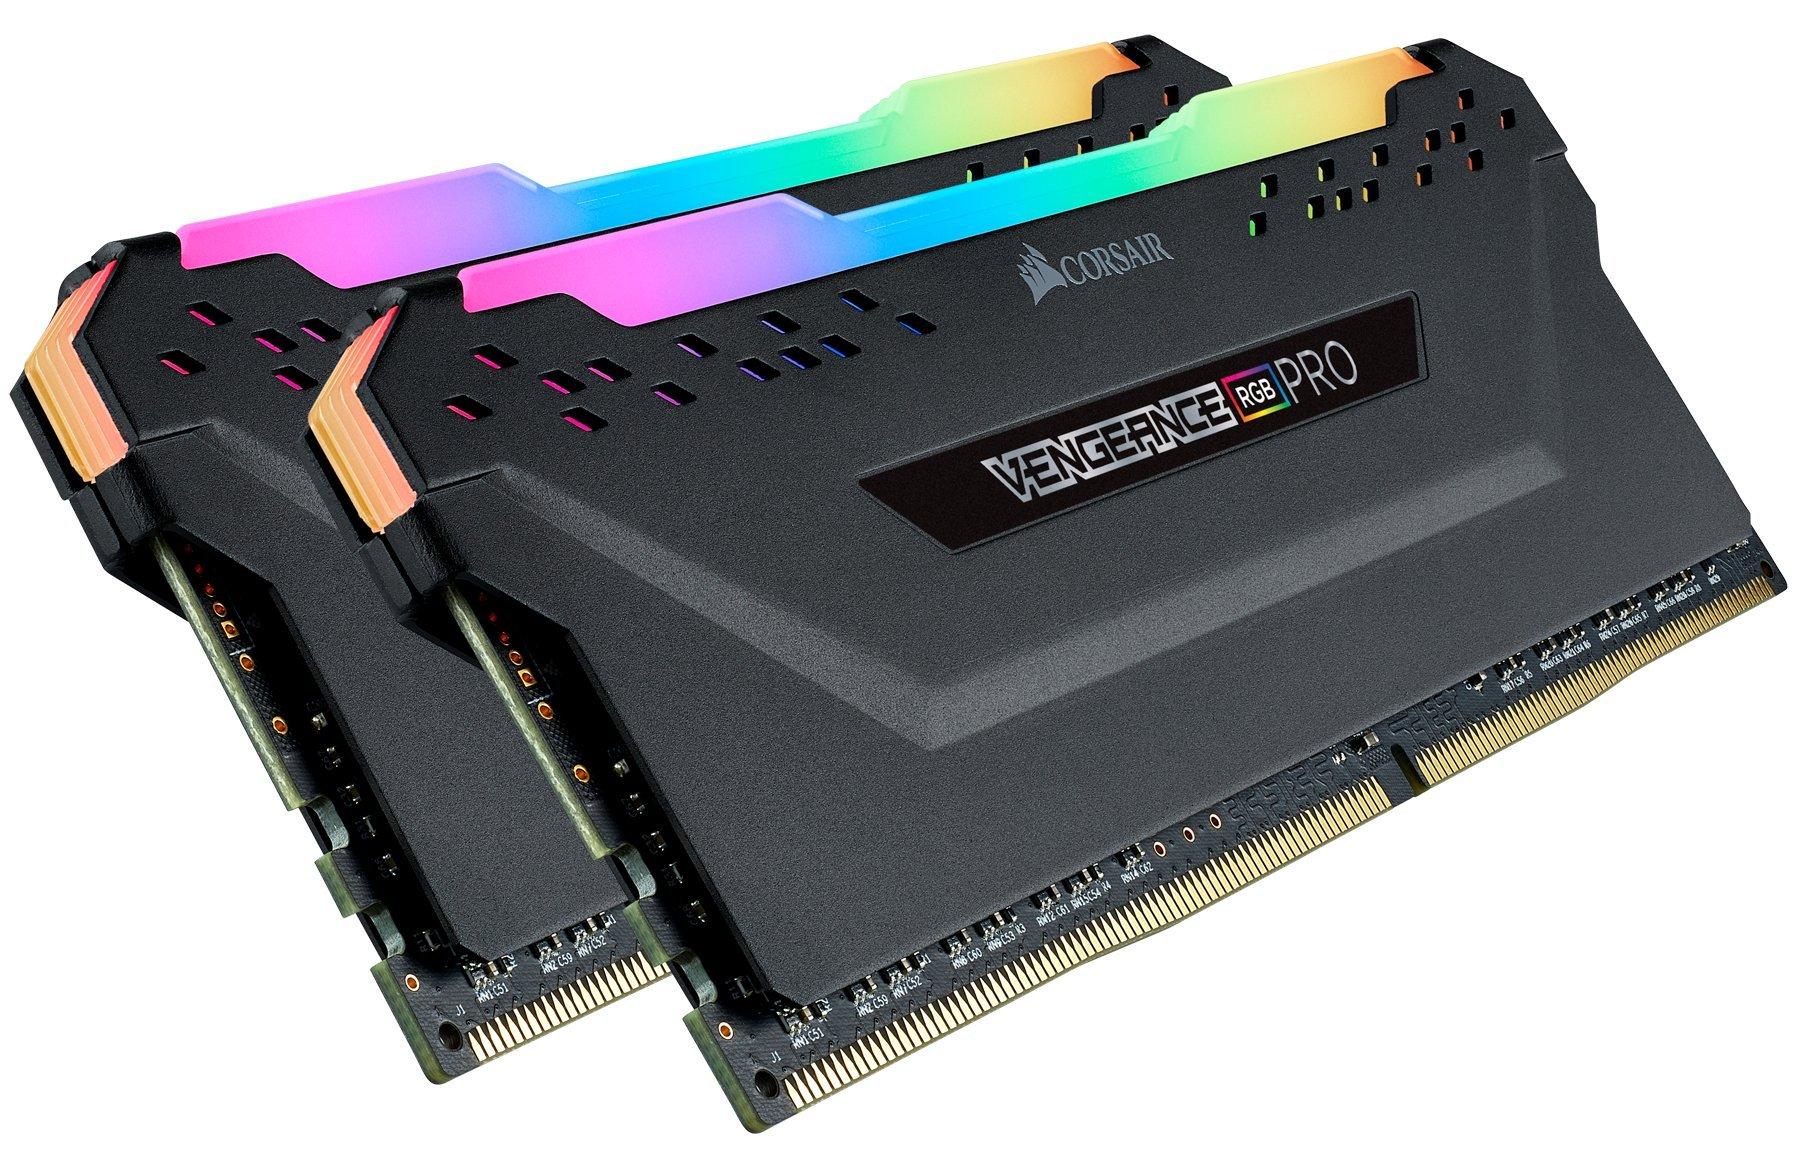 Corsair Vengeance RGB Pro 16GB (2x8GB) DDR4 3600 (PC4-28800) C18 AMD Optimized Memory - Black by Corsair